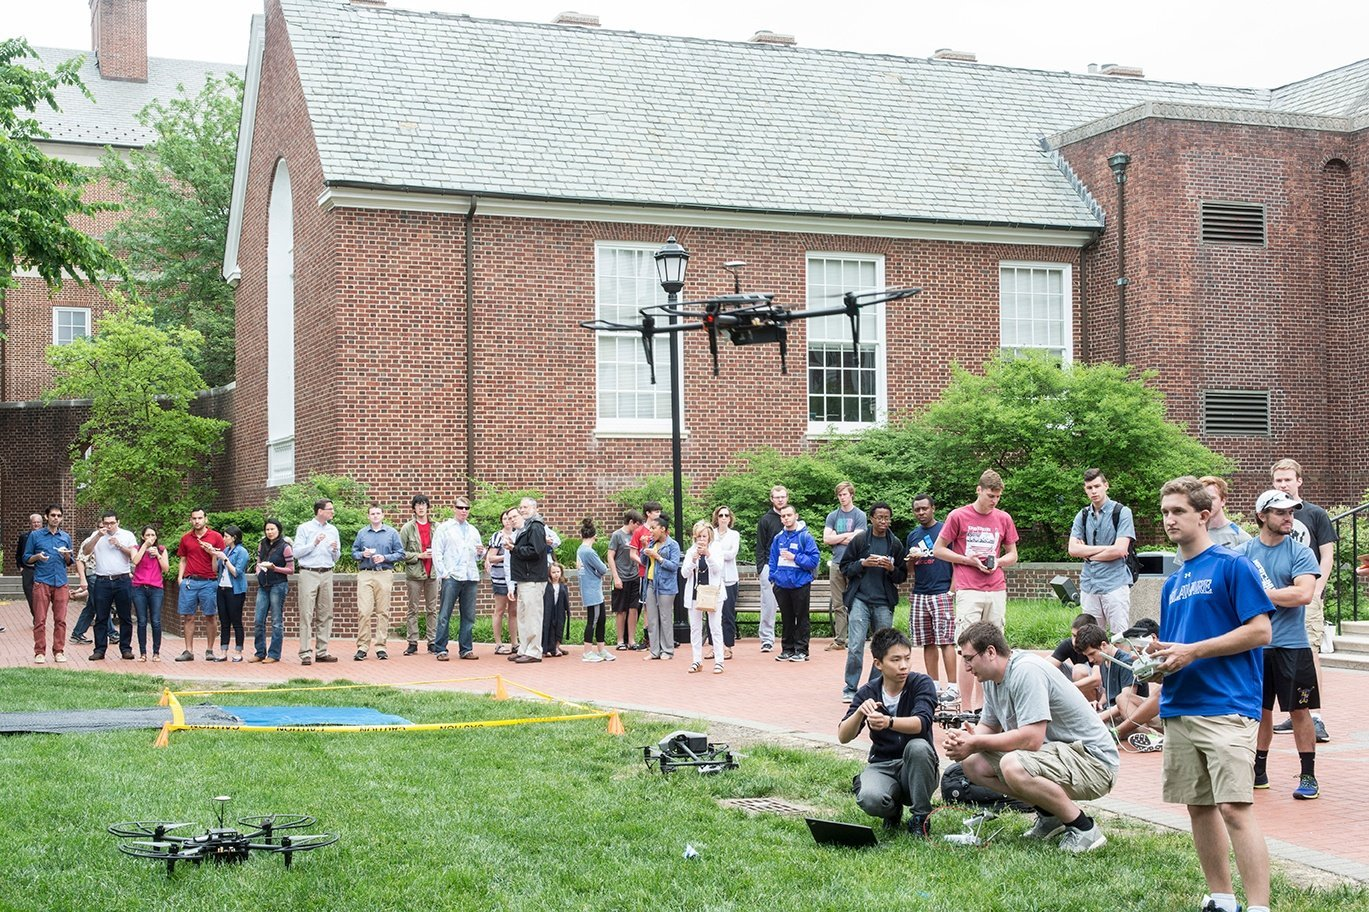 drones on university campus.jpg